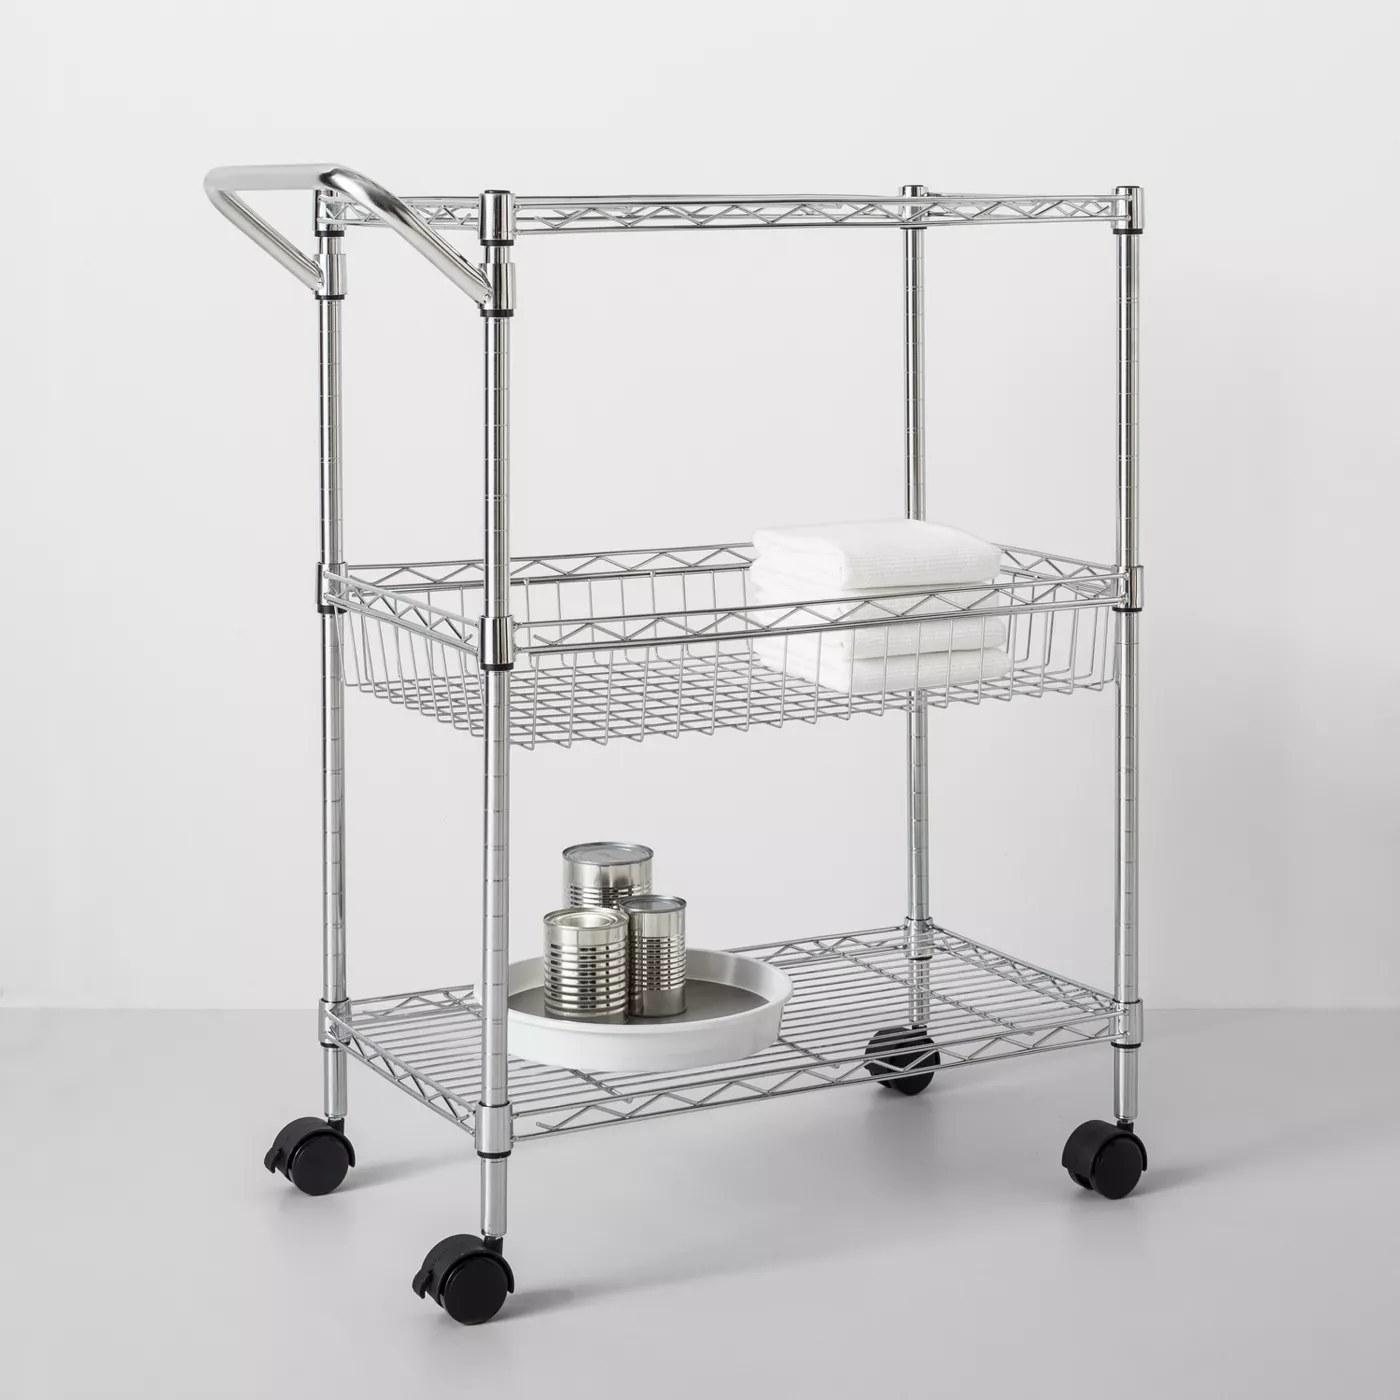 A metal storage cart